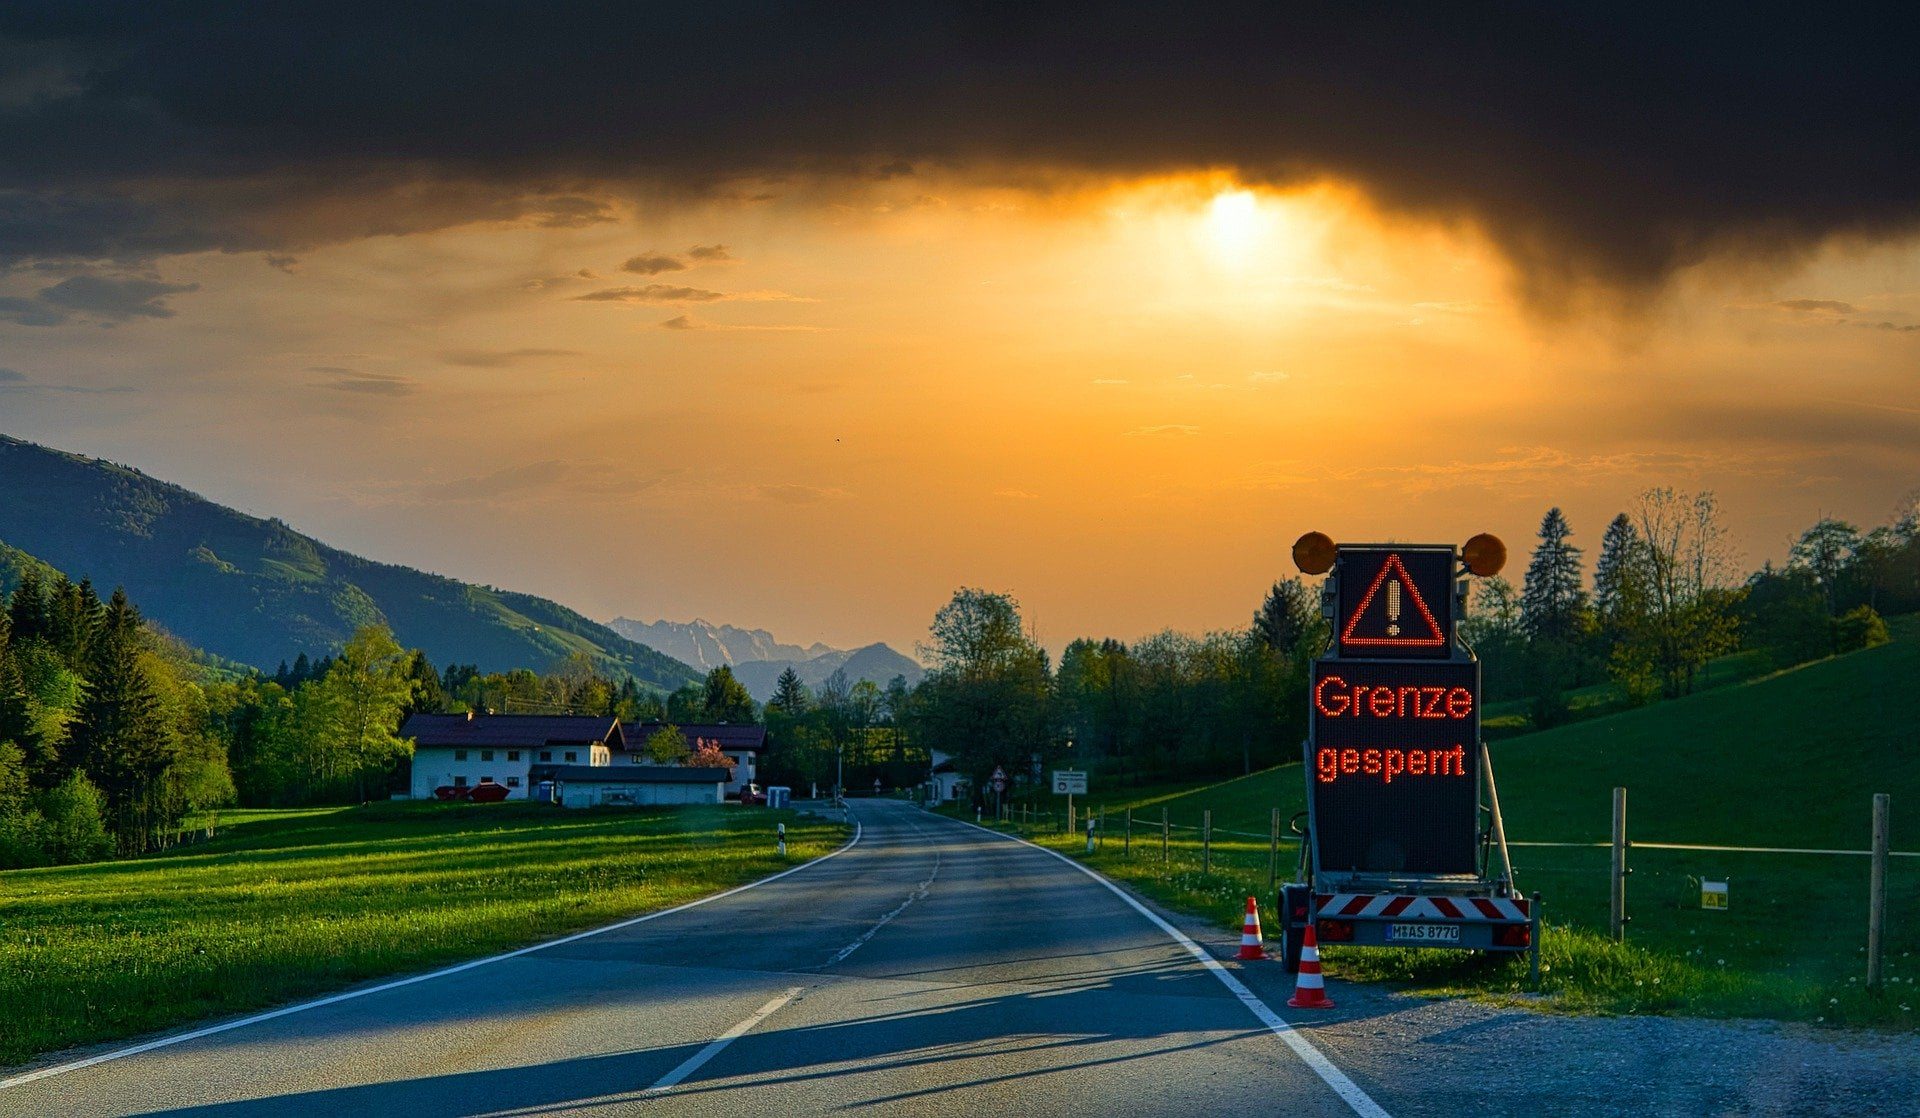 Corona Reisen COVID-19 Reiseverbot Reisewarnung